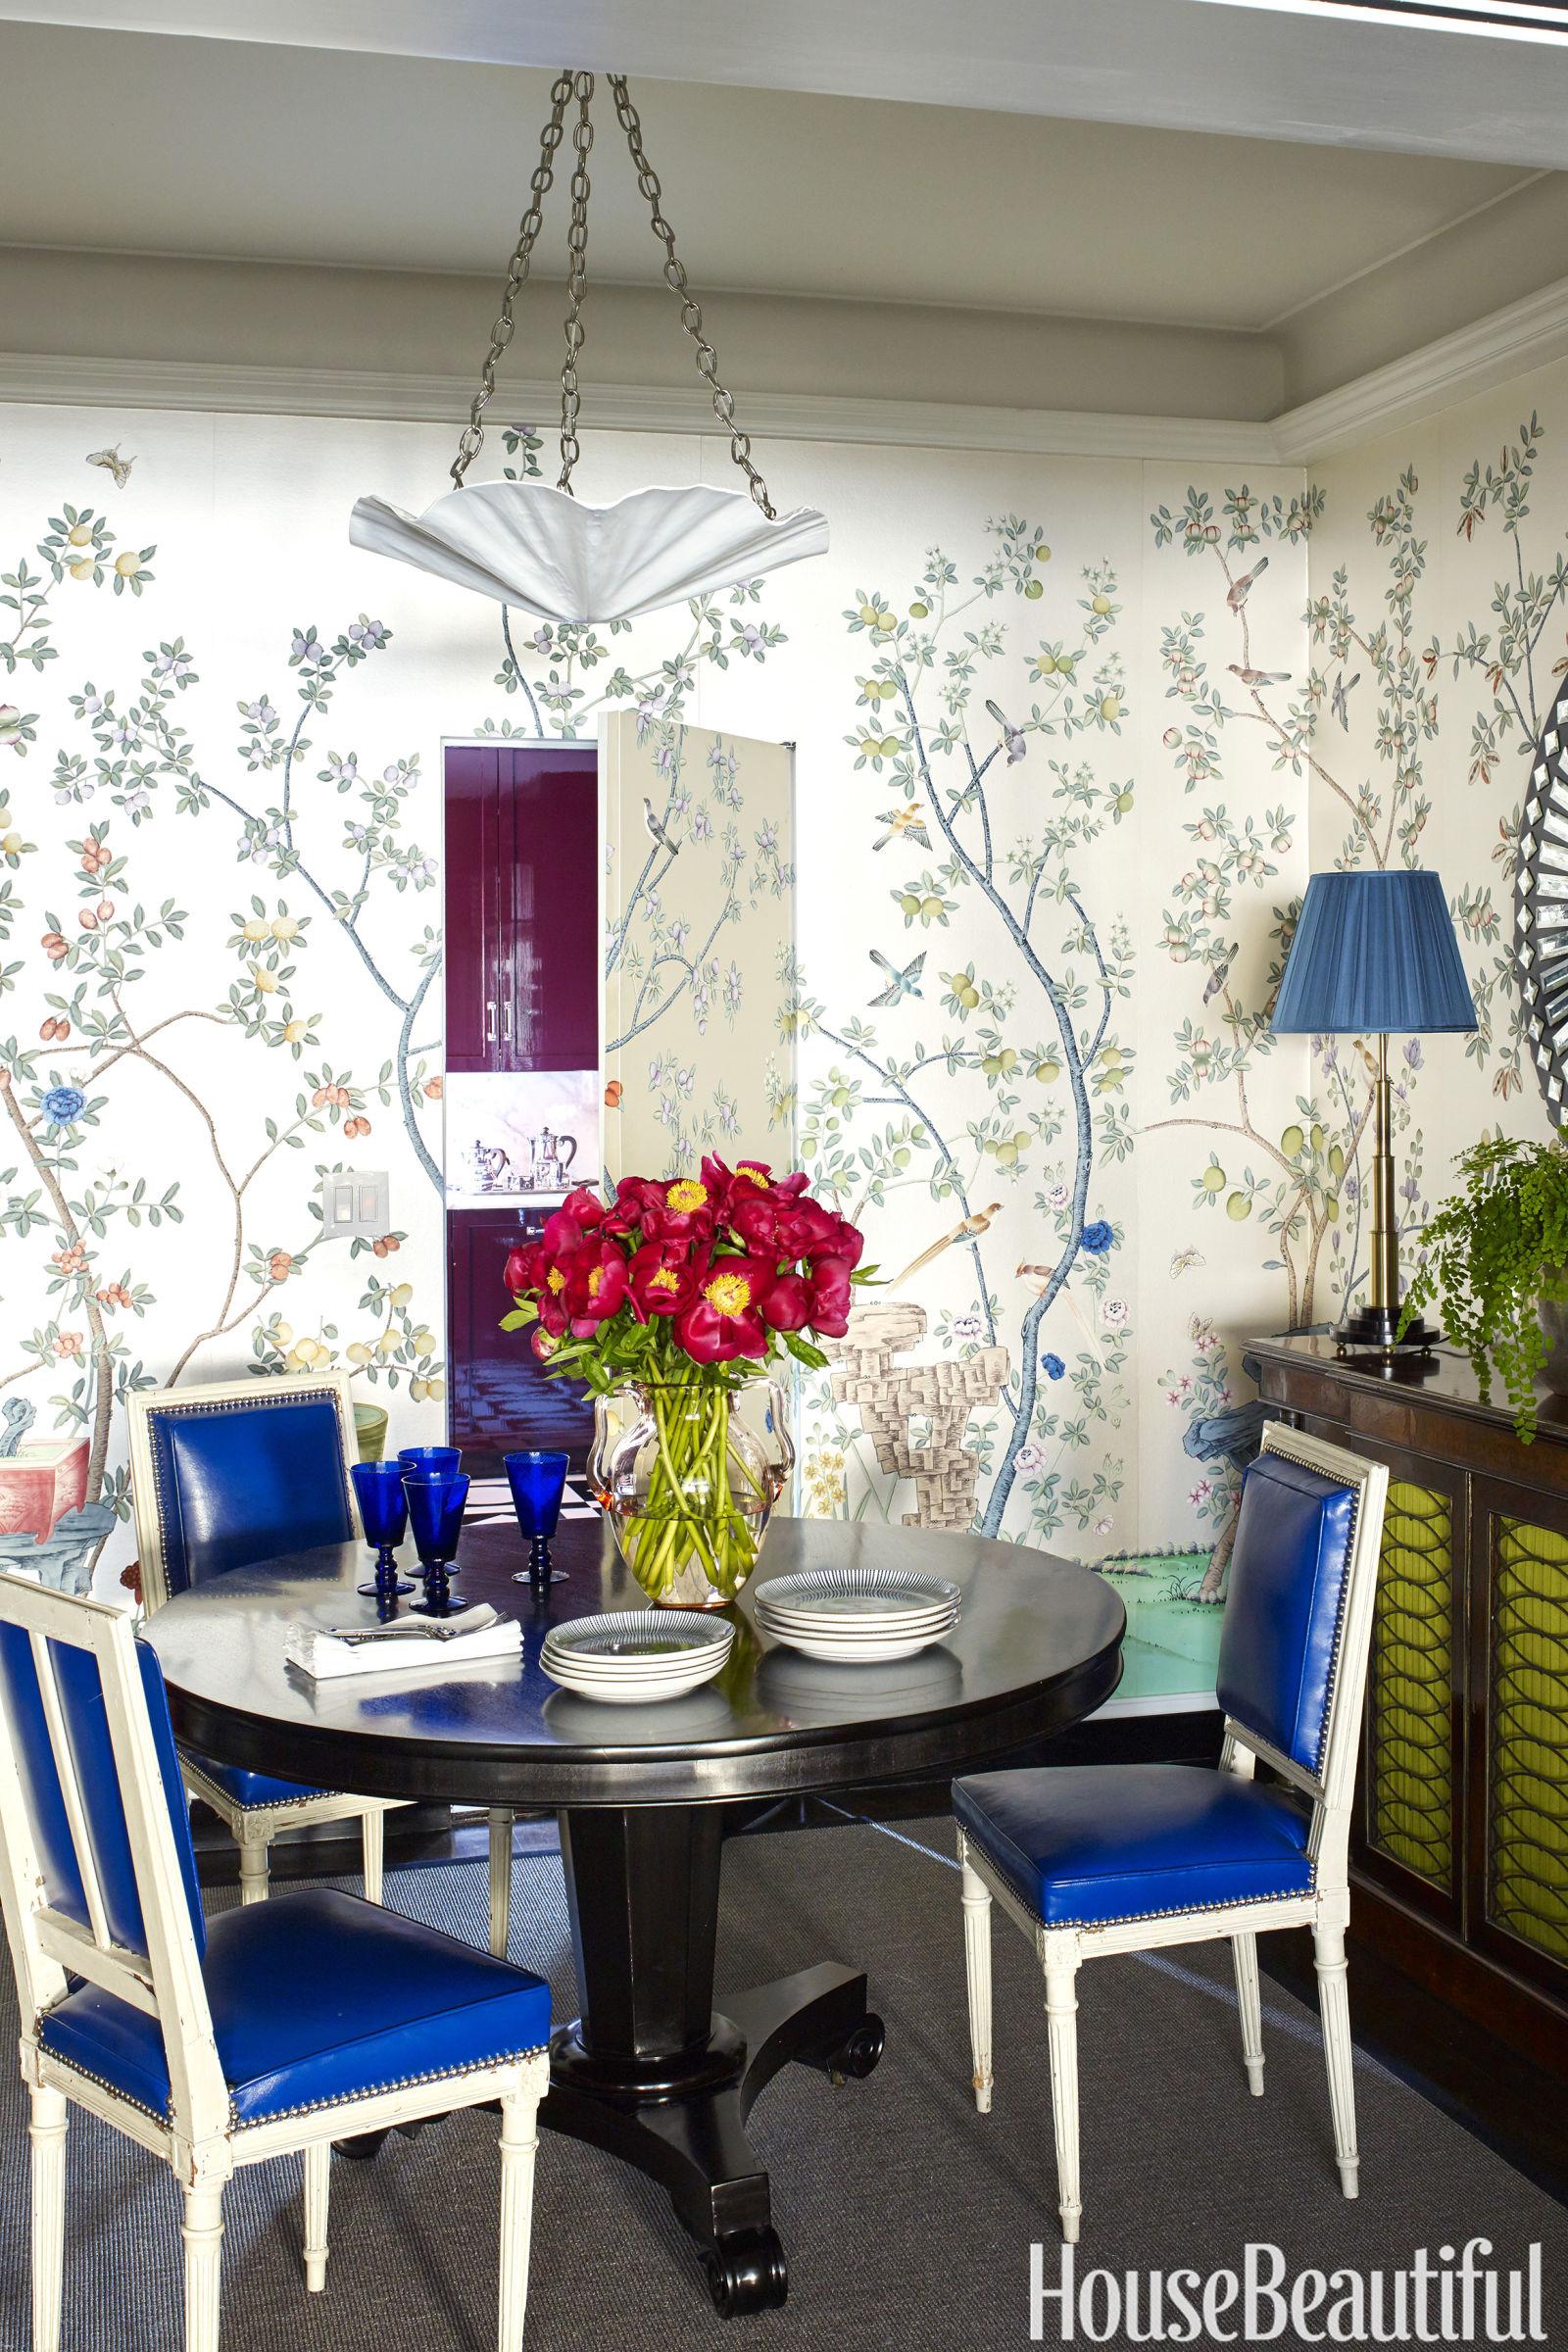 nick-olsen-dining-room.jpg